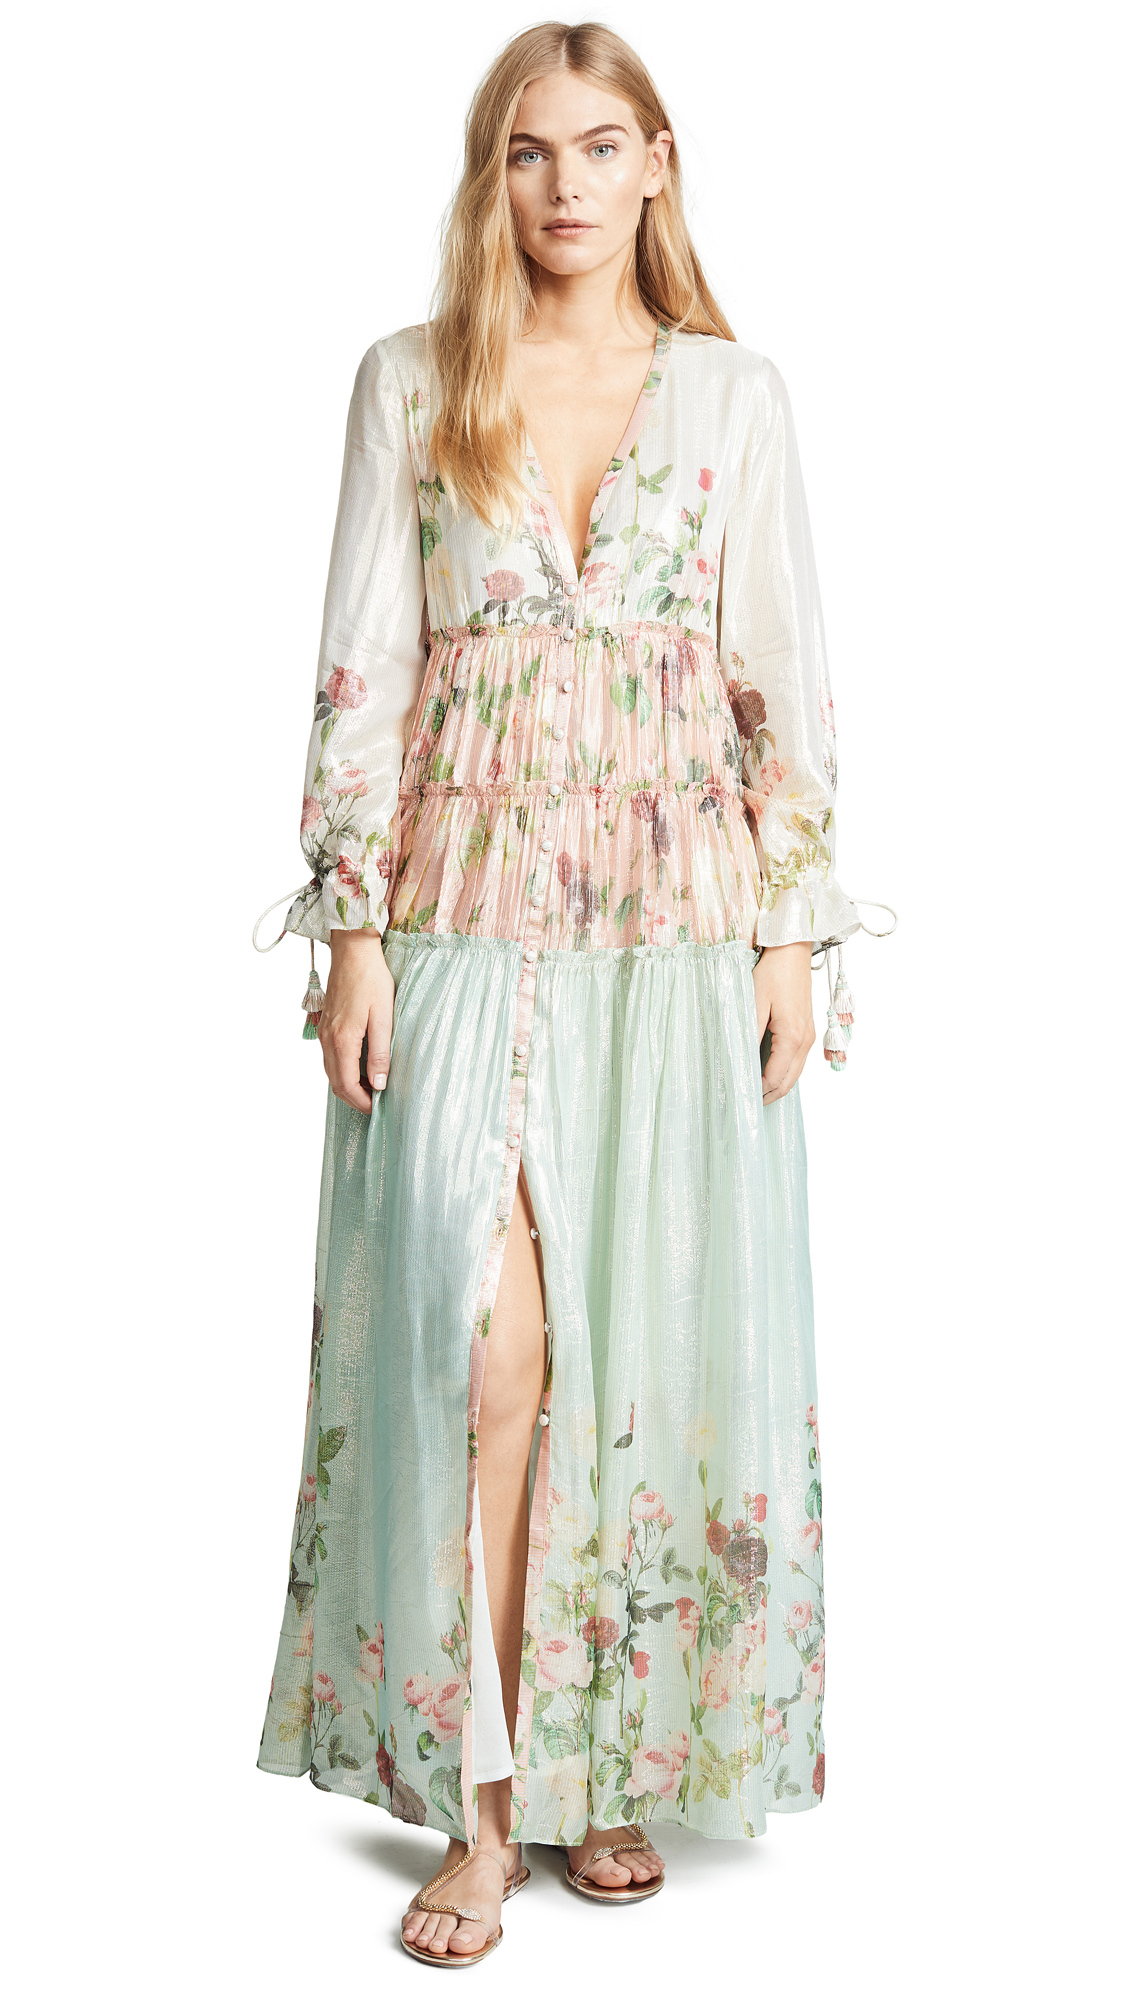 ROCOCO SAND Nalani Dress in Multi